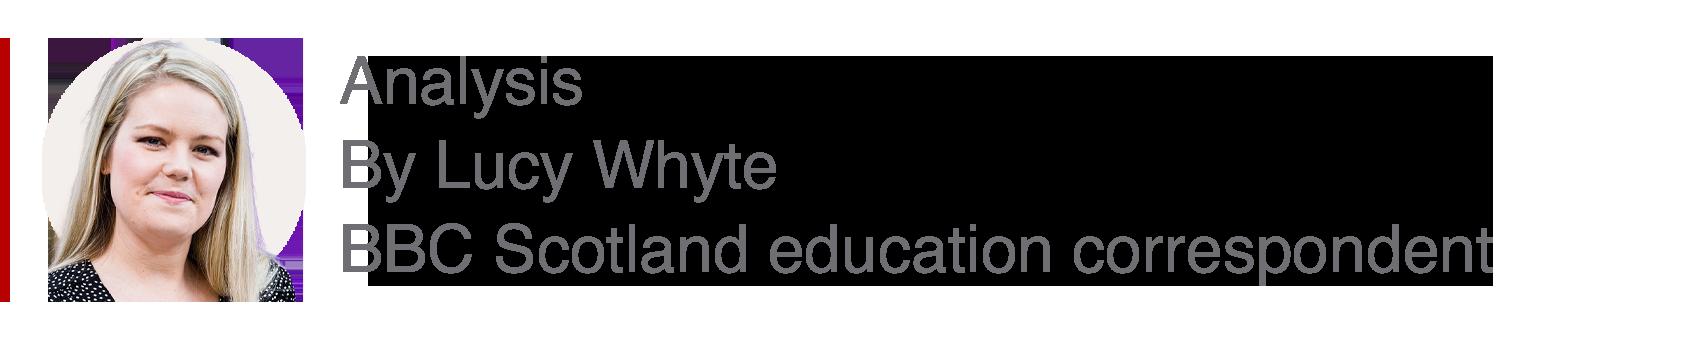 Analysis box by Lucy Whyte, BBC Scotland education correspondent